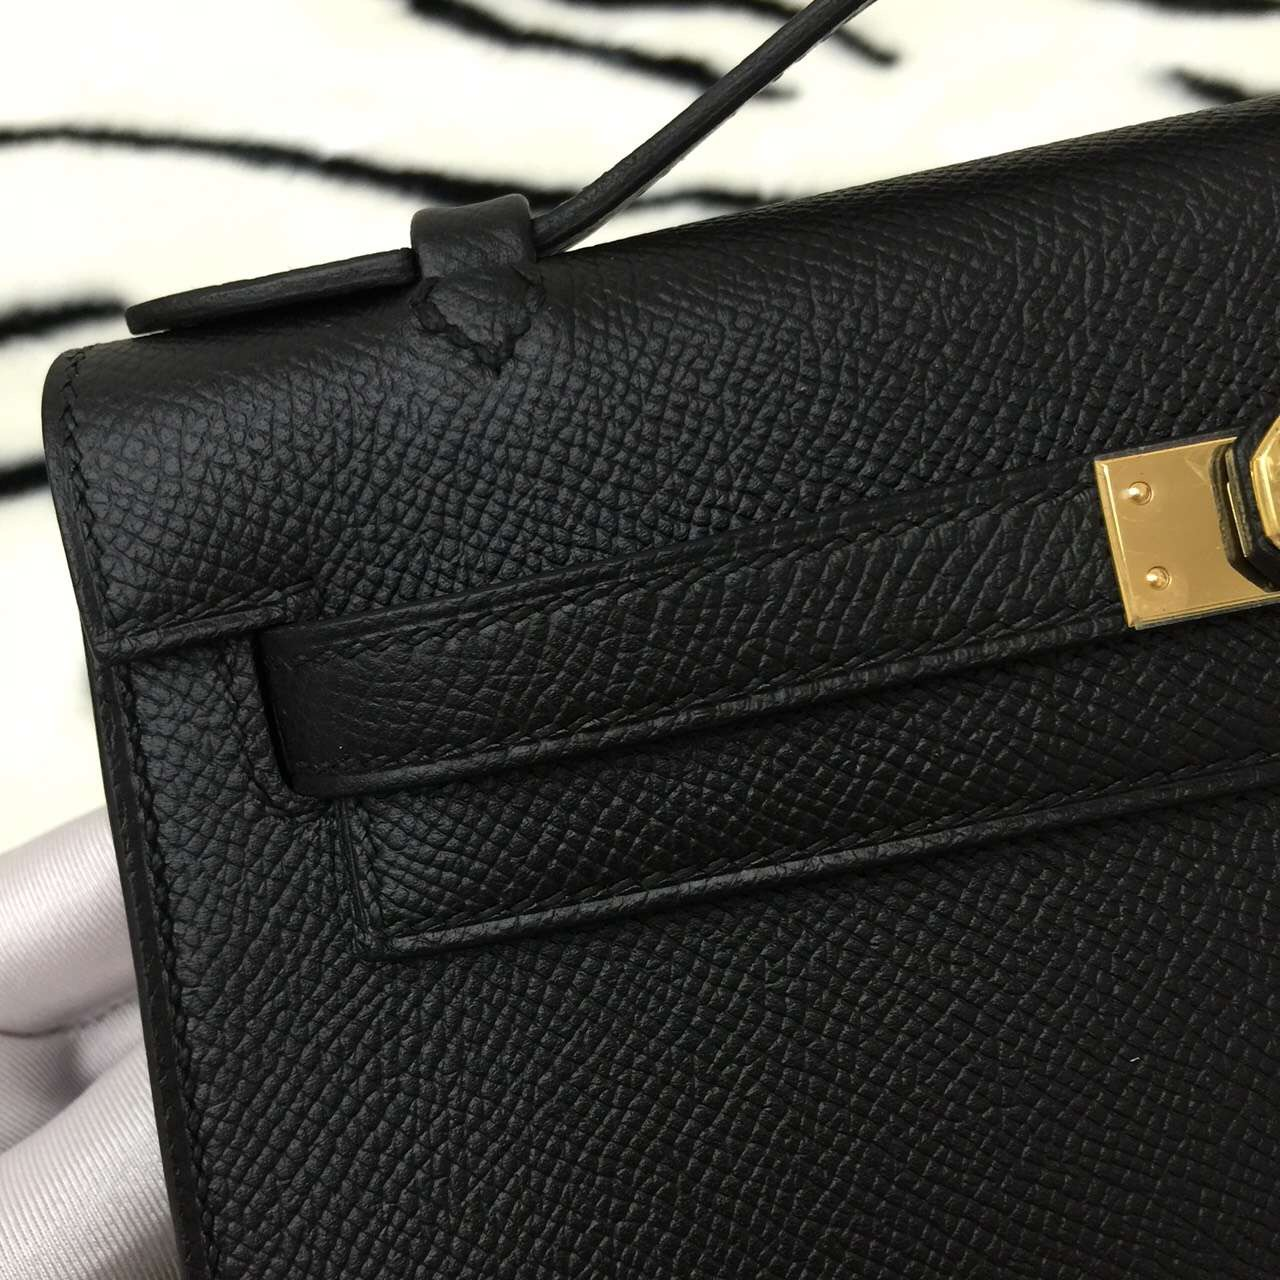 Discount Hermes Epsom Leather Mini Kelly Bag CK89 Black Fashion Ladies' Tote Bag